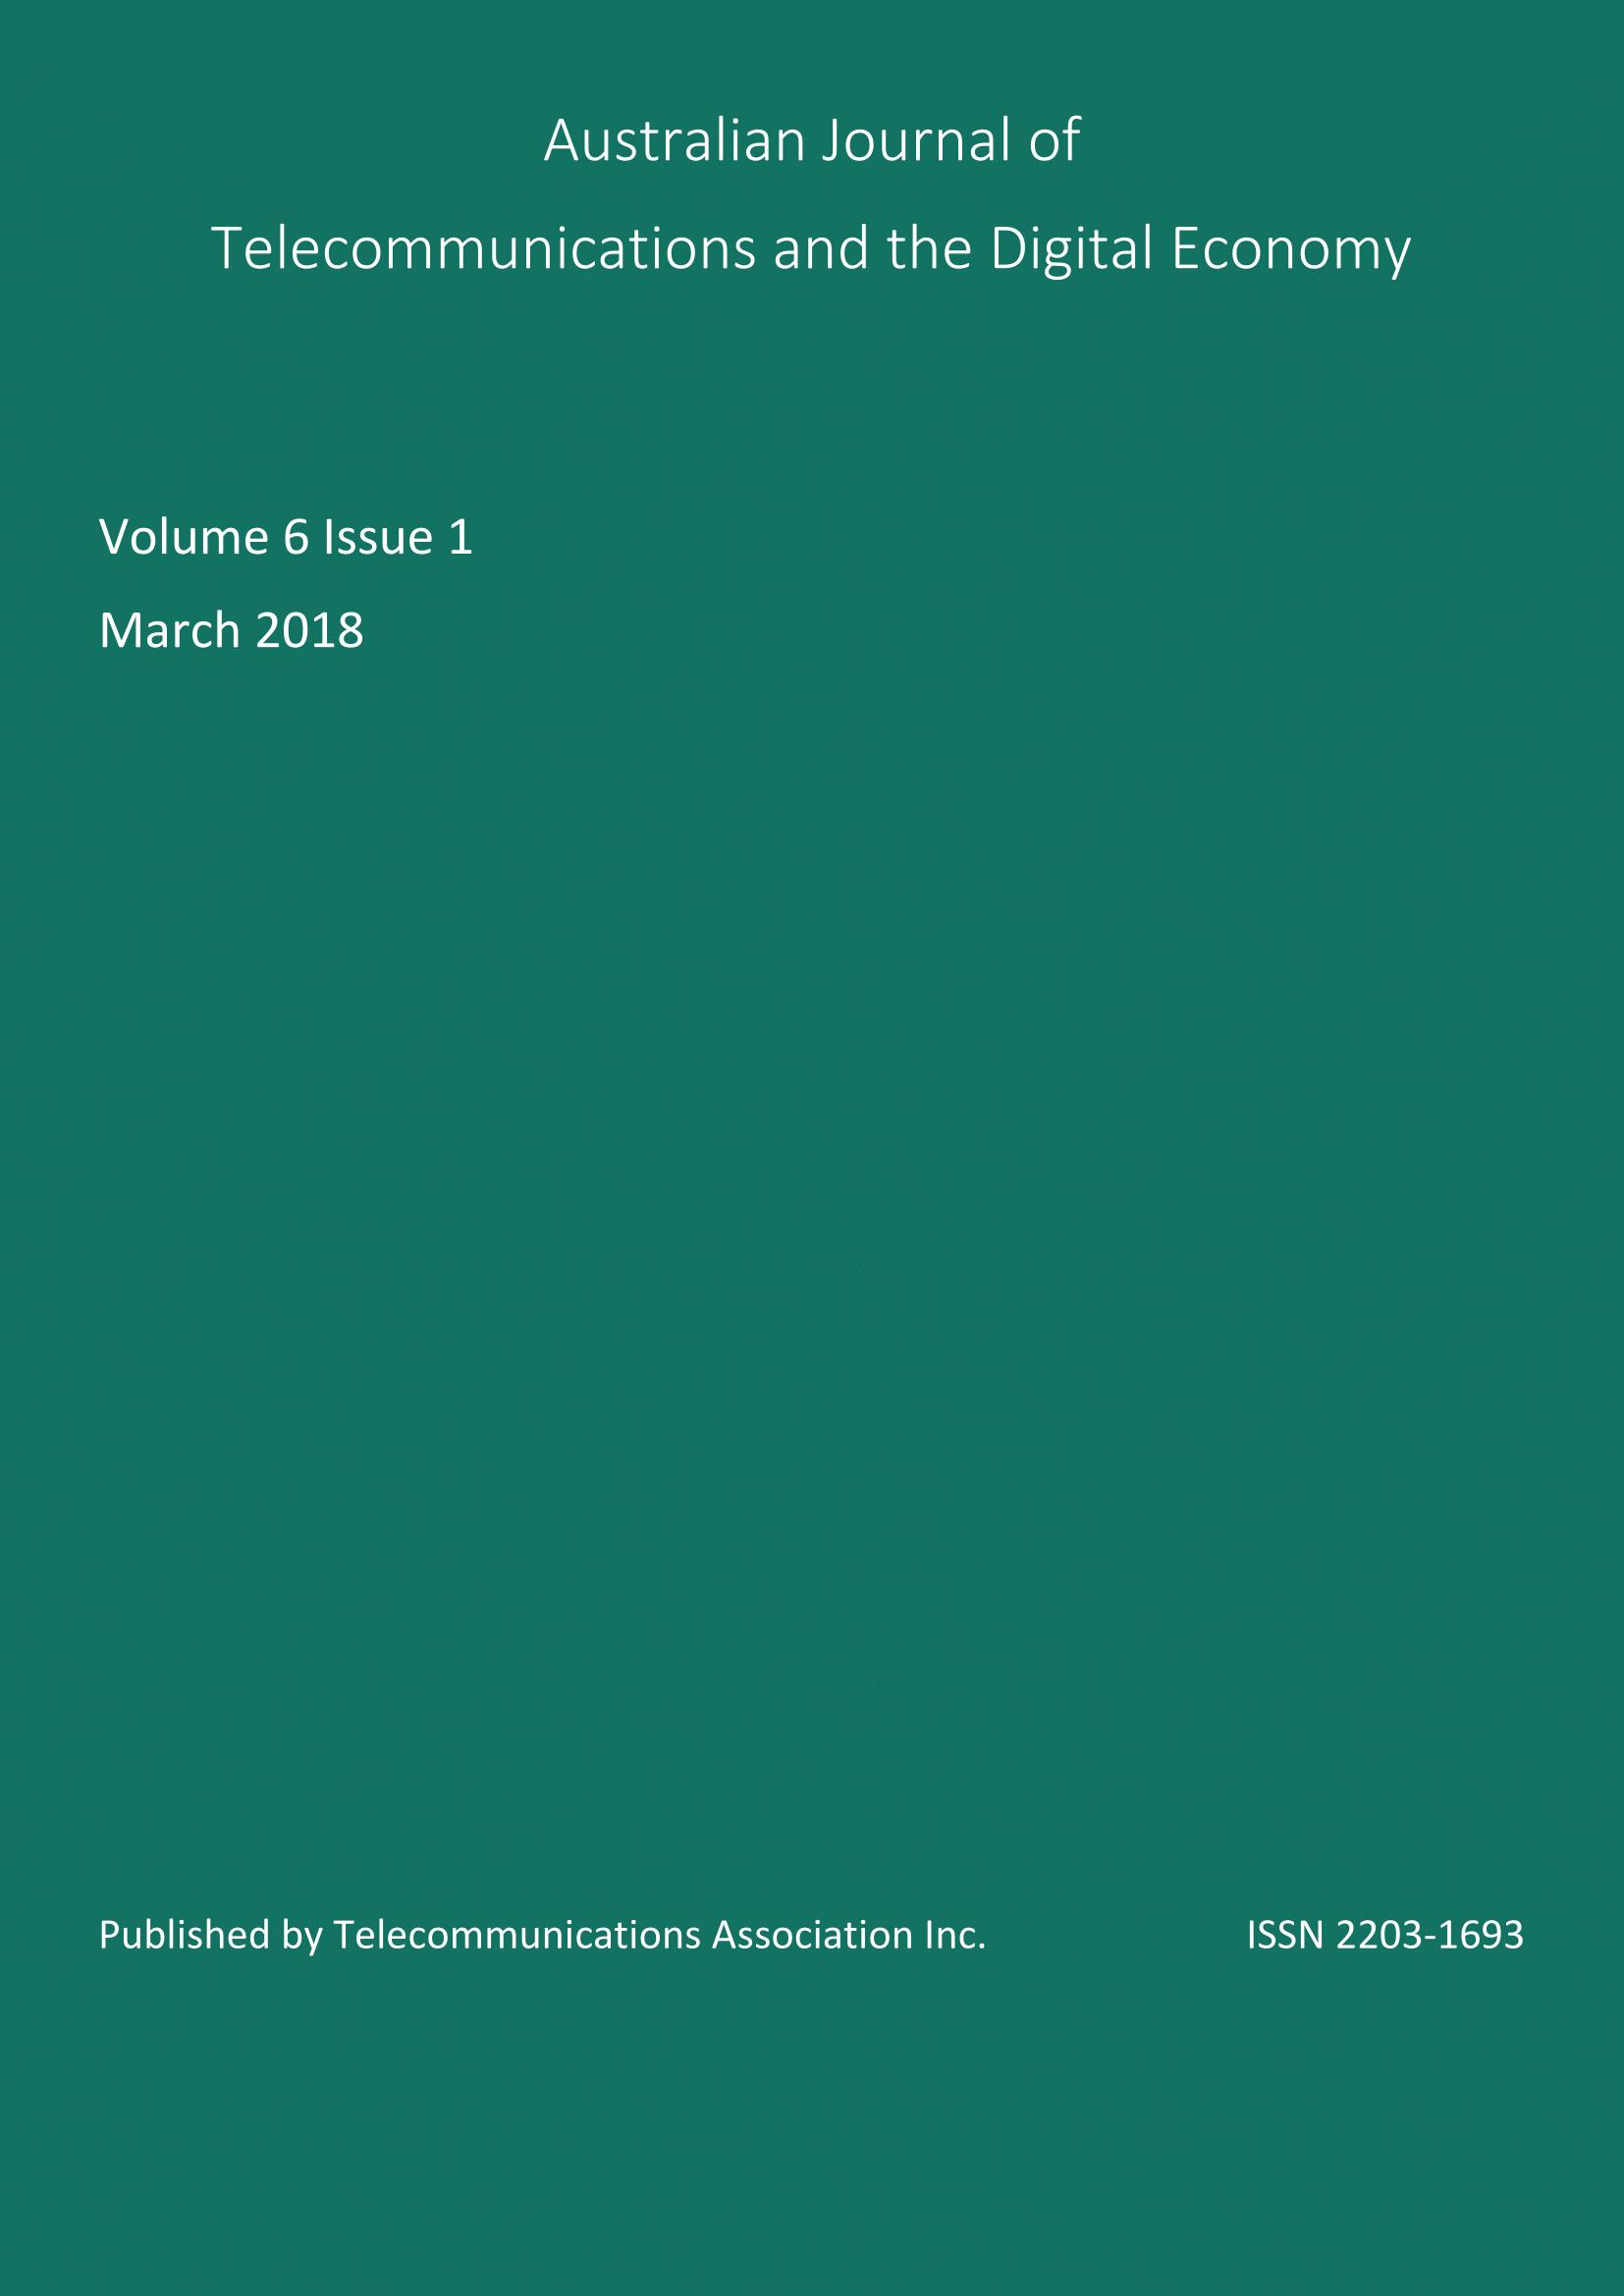 Vol. 6, No. 1 (2018)